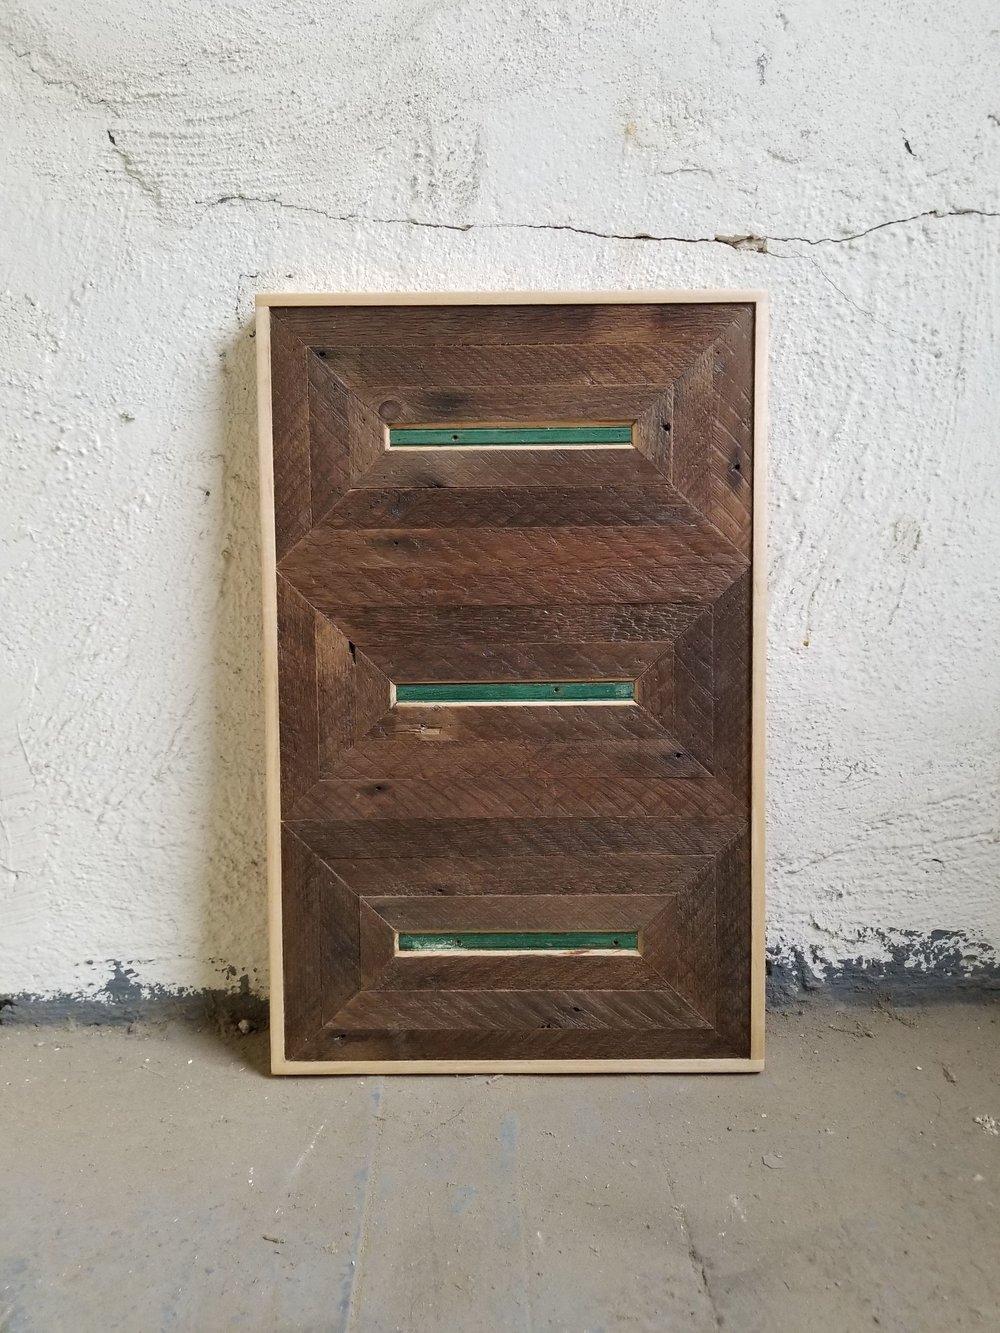 Untitled III   Wood   19 x 12 in